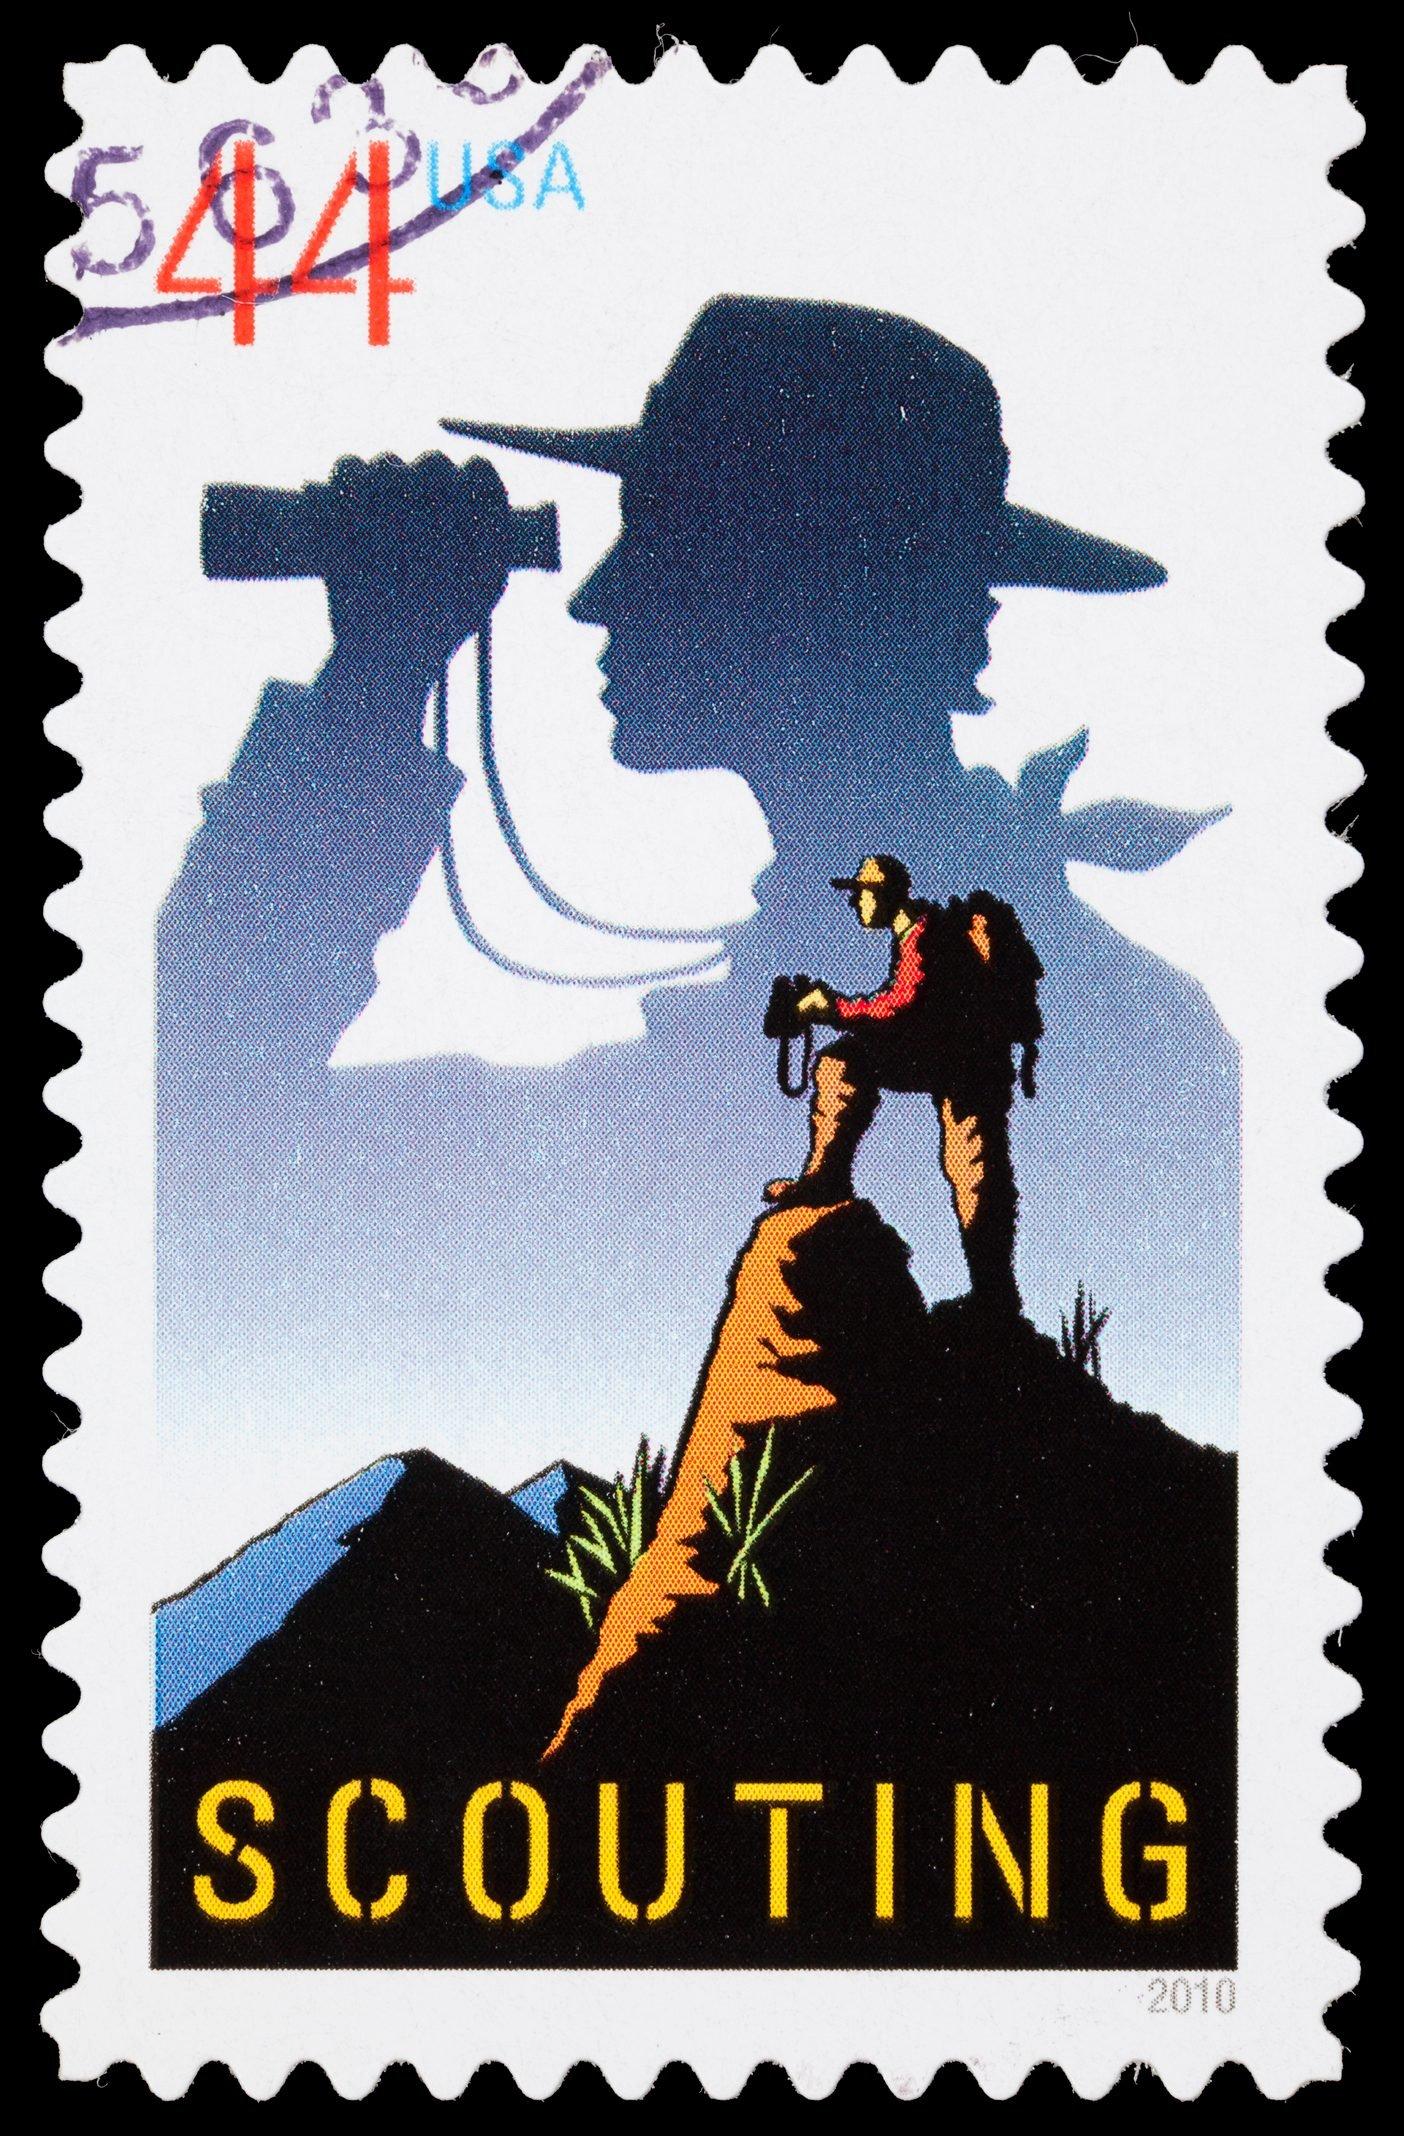 USA Scouting postage stamp